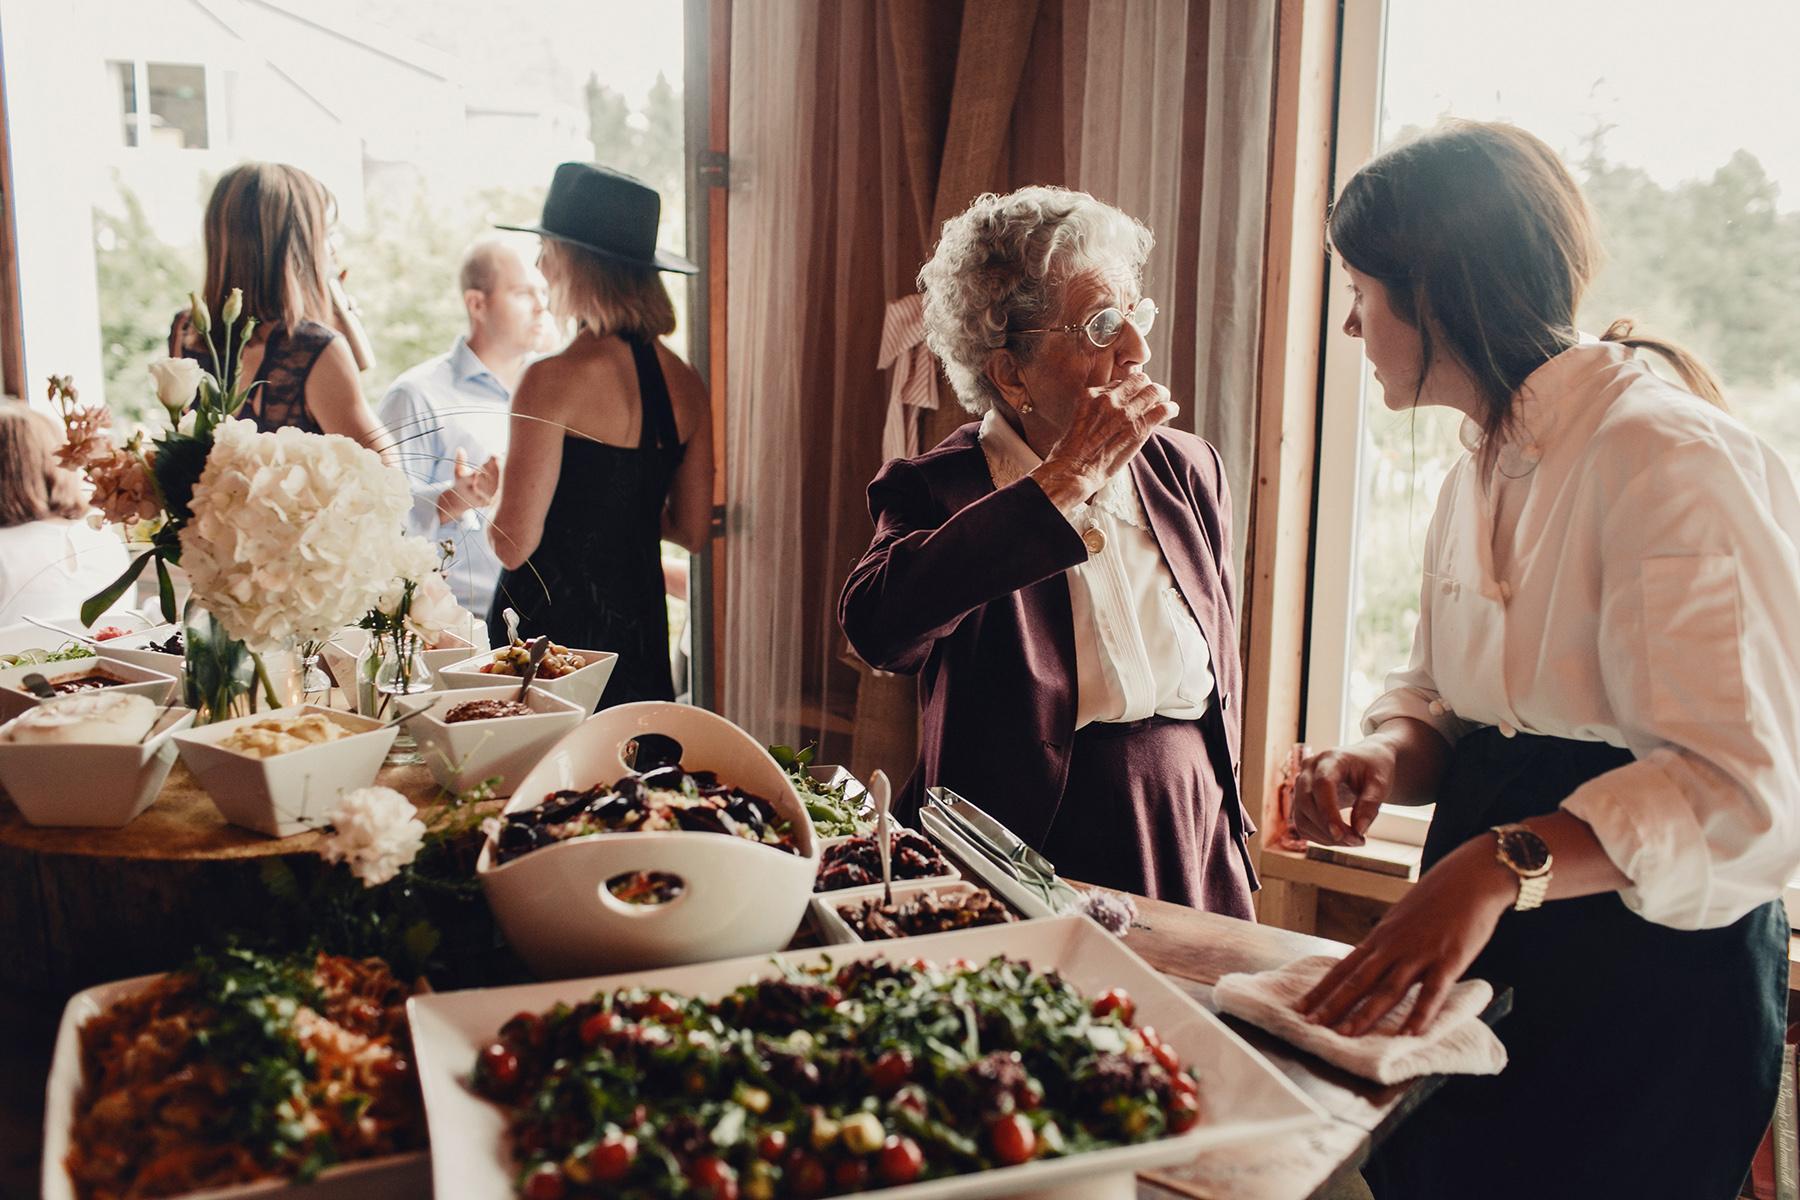 kildara-farms-wedding-photo-inspiration-0094